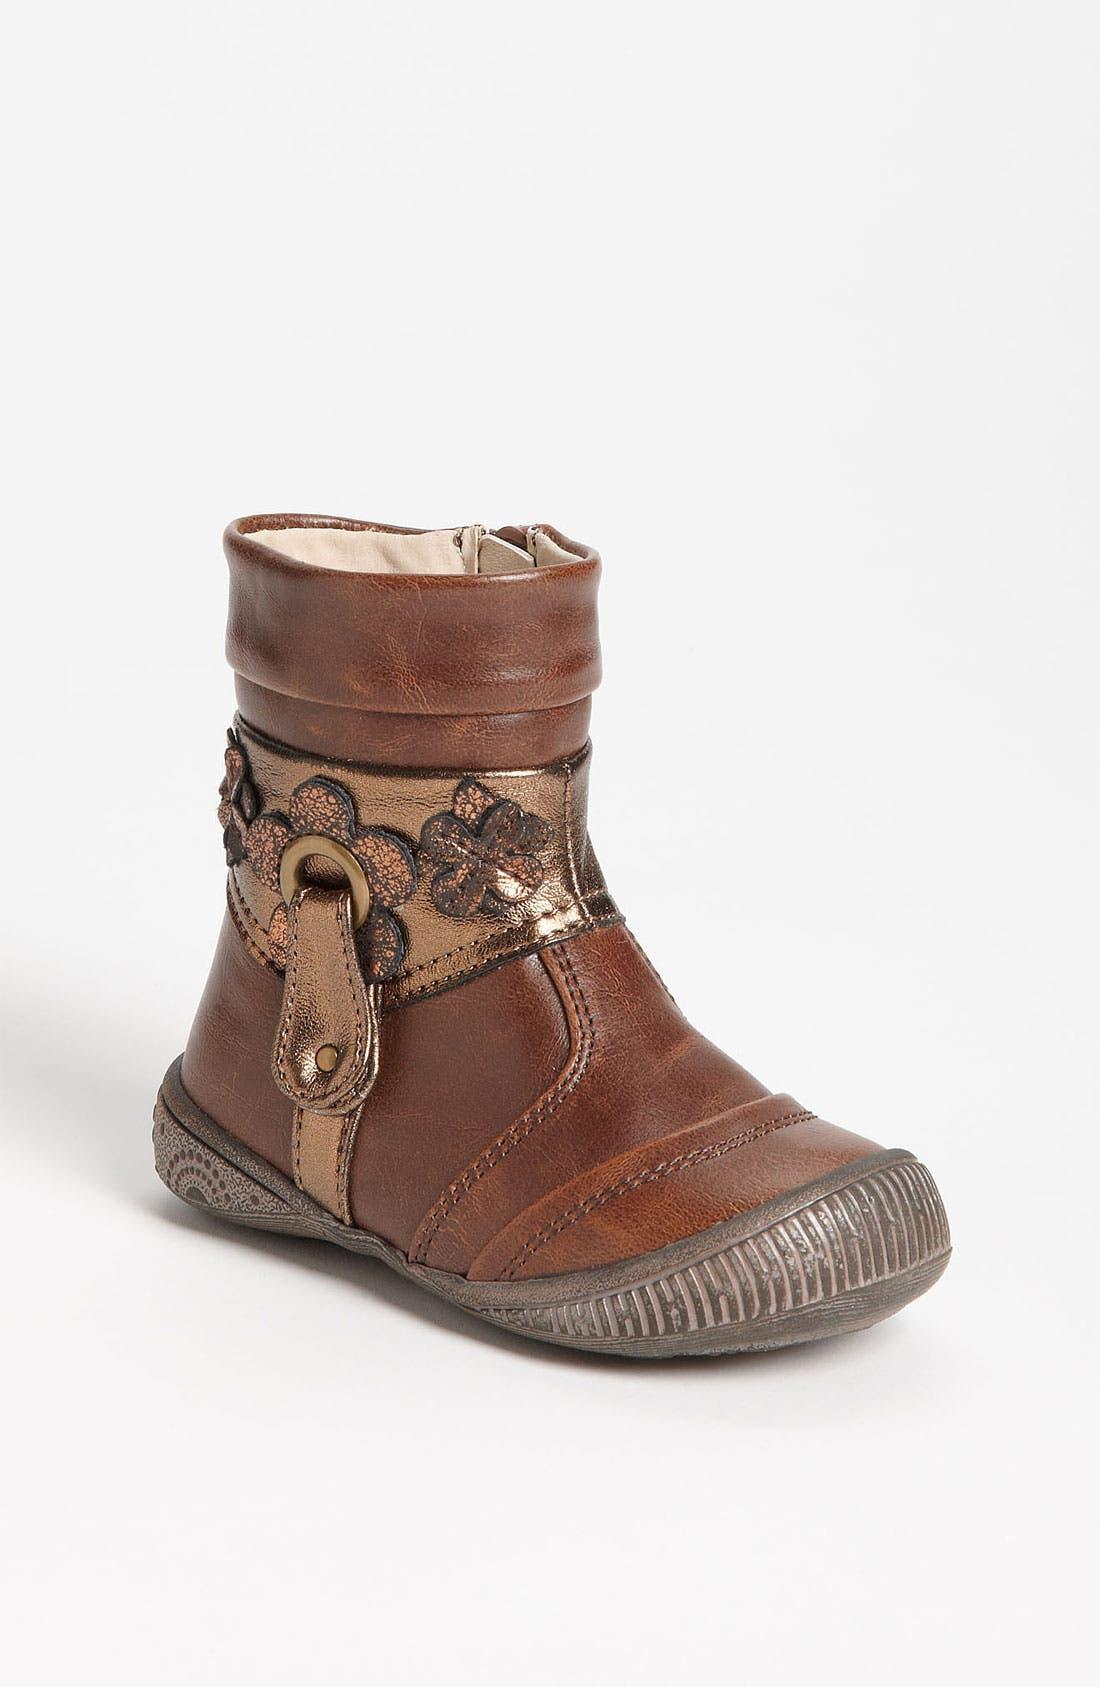 Main Image - kensie girl 'Flower' Boot (Walker & Toddler)